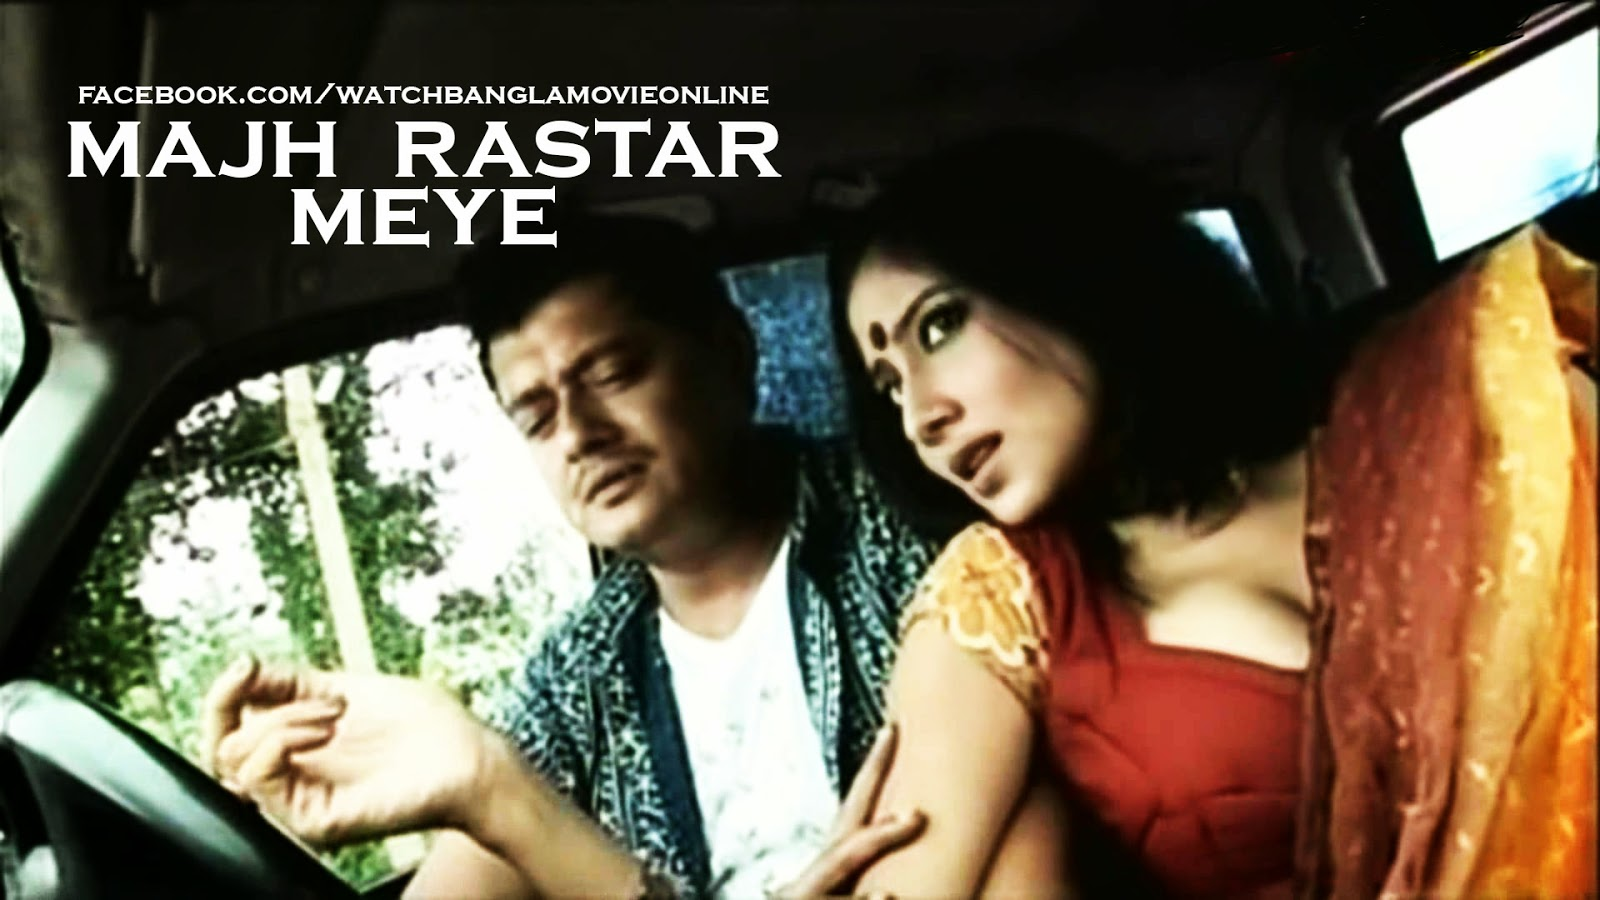 Bengali film gandu online dating 10